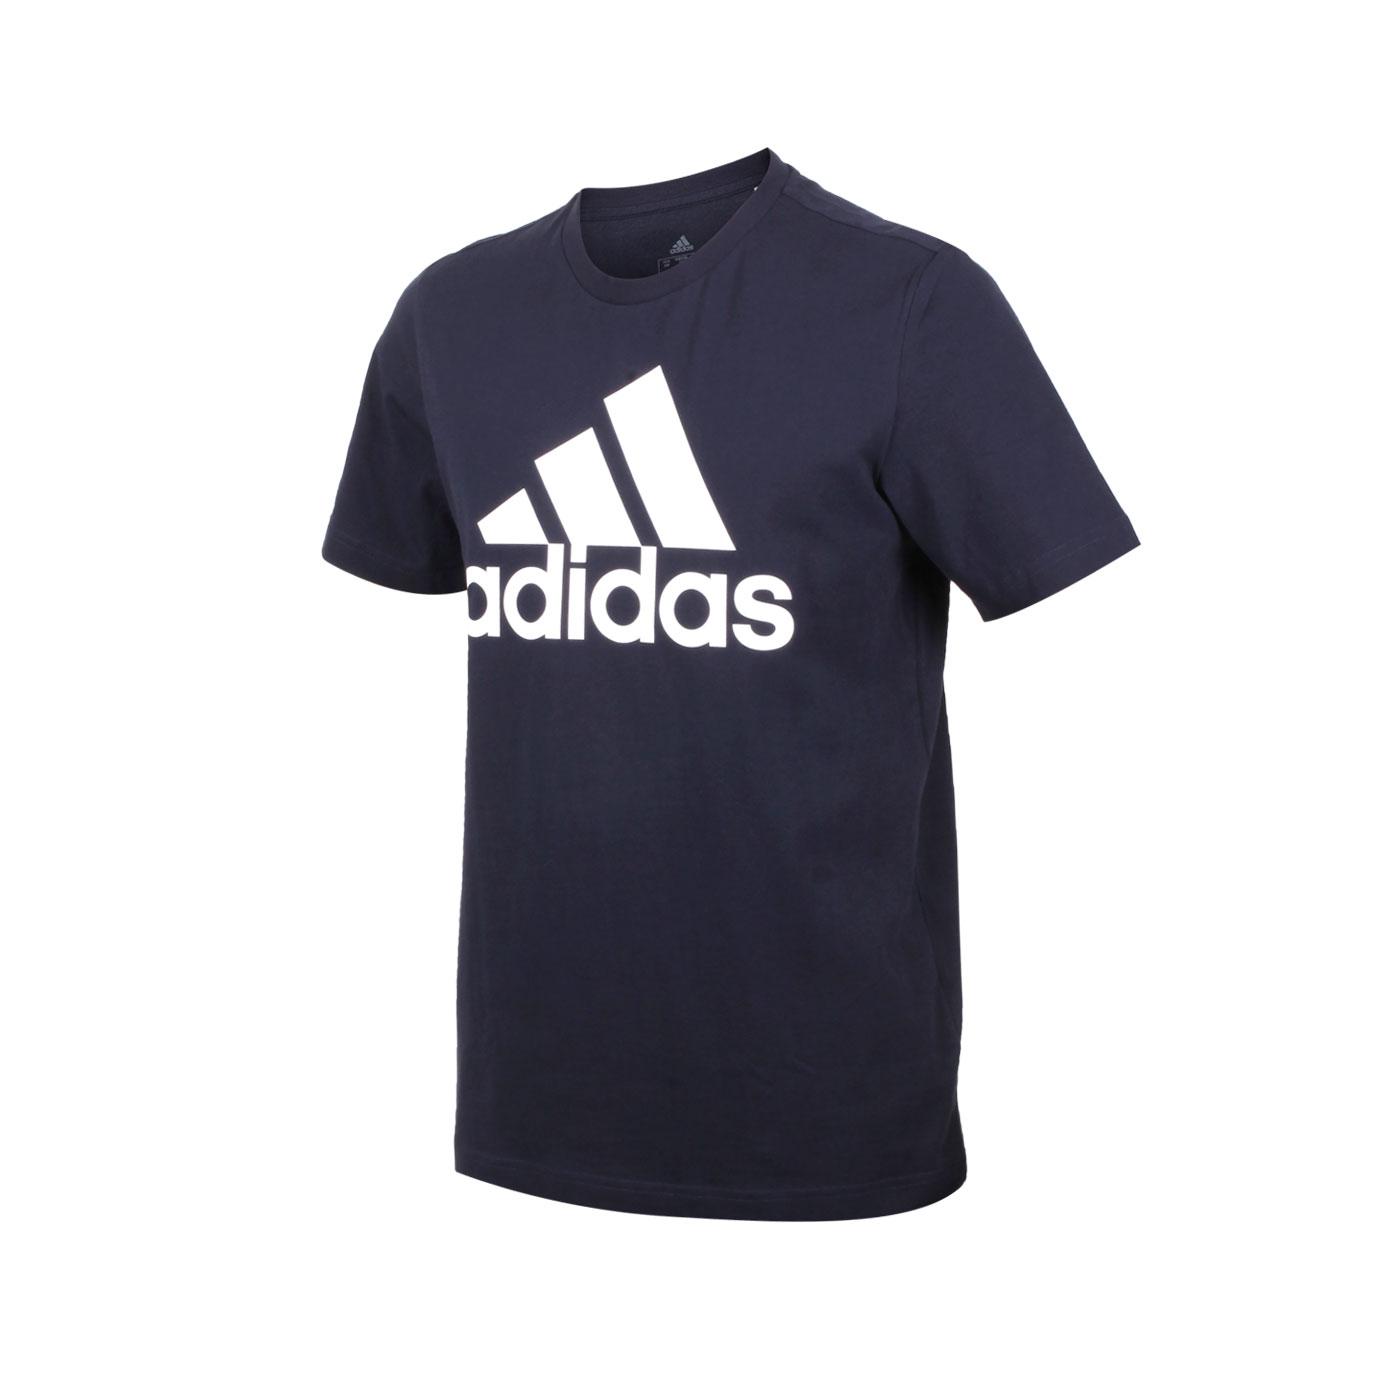 ADIDAS 男款短袖T恤 GK9122